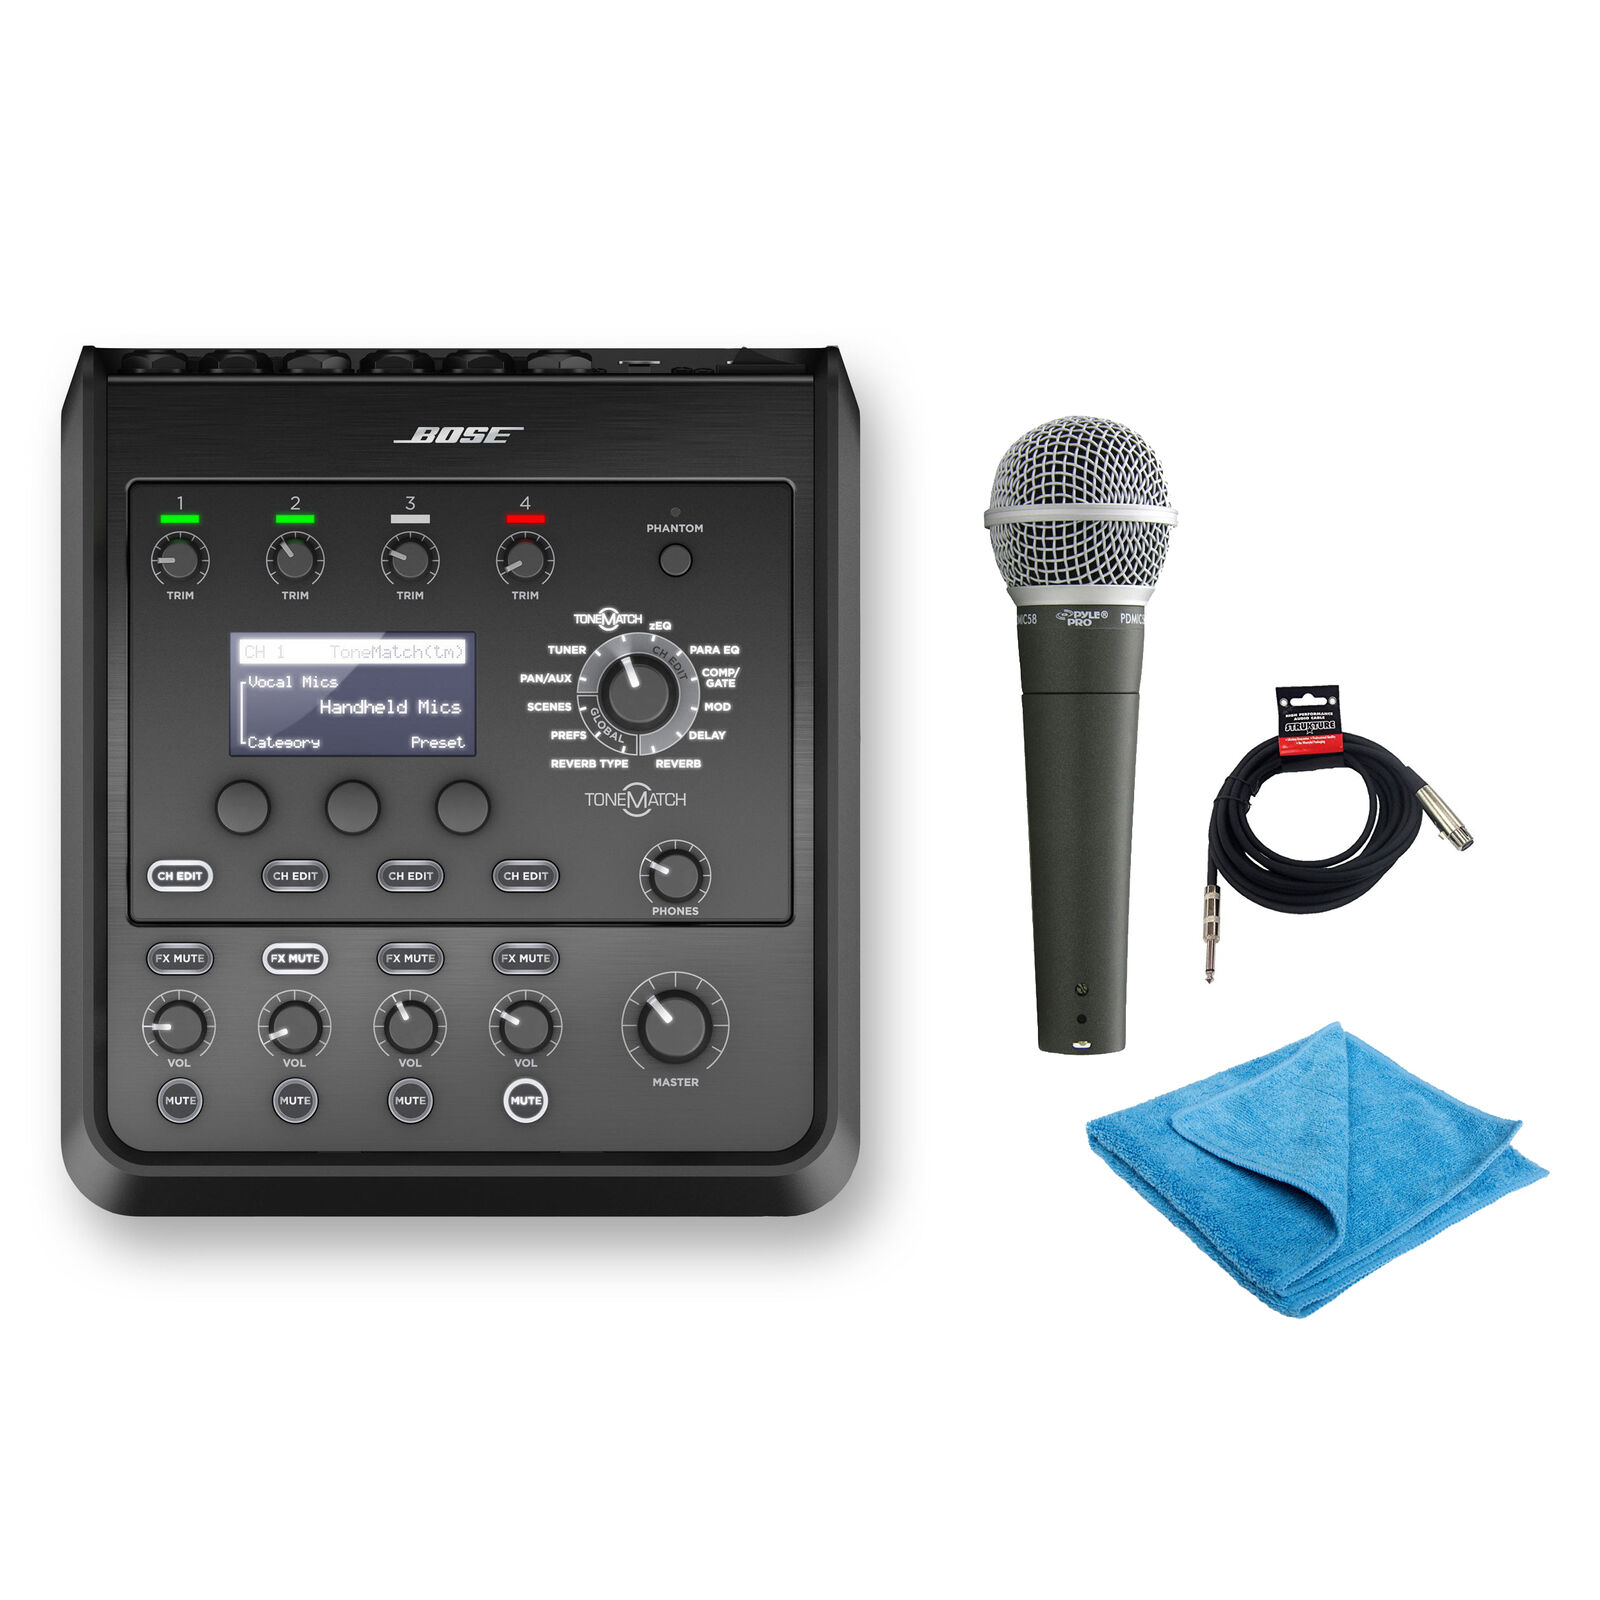 Bose T4S ToneMatch Mixer mit PDMICS58 Mikrofon, Kabel && Reinigungstuch